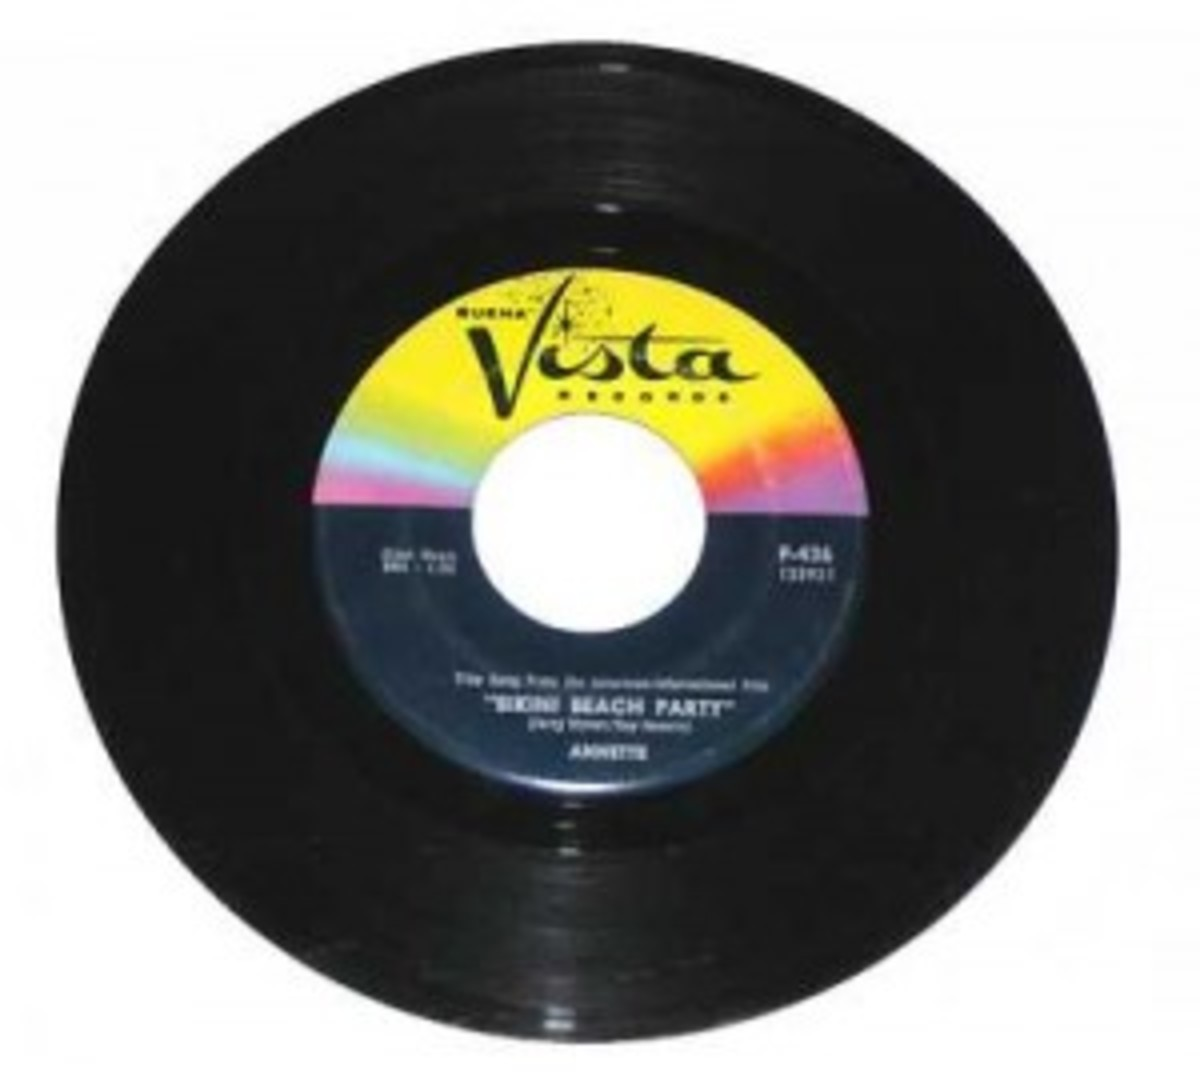 Annette Buena Vista 436